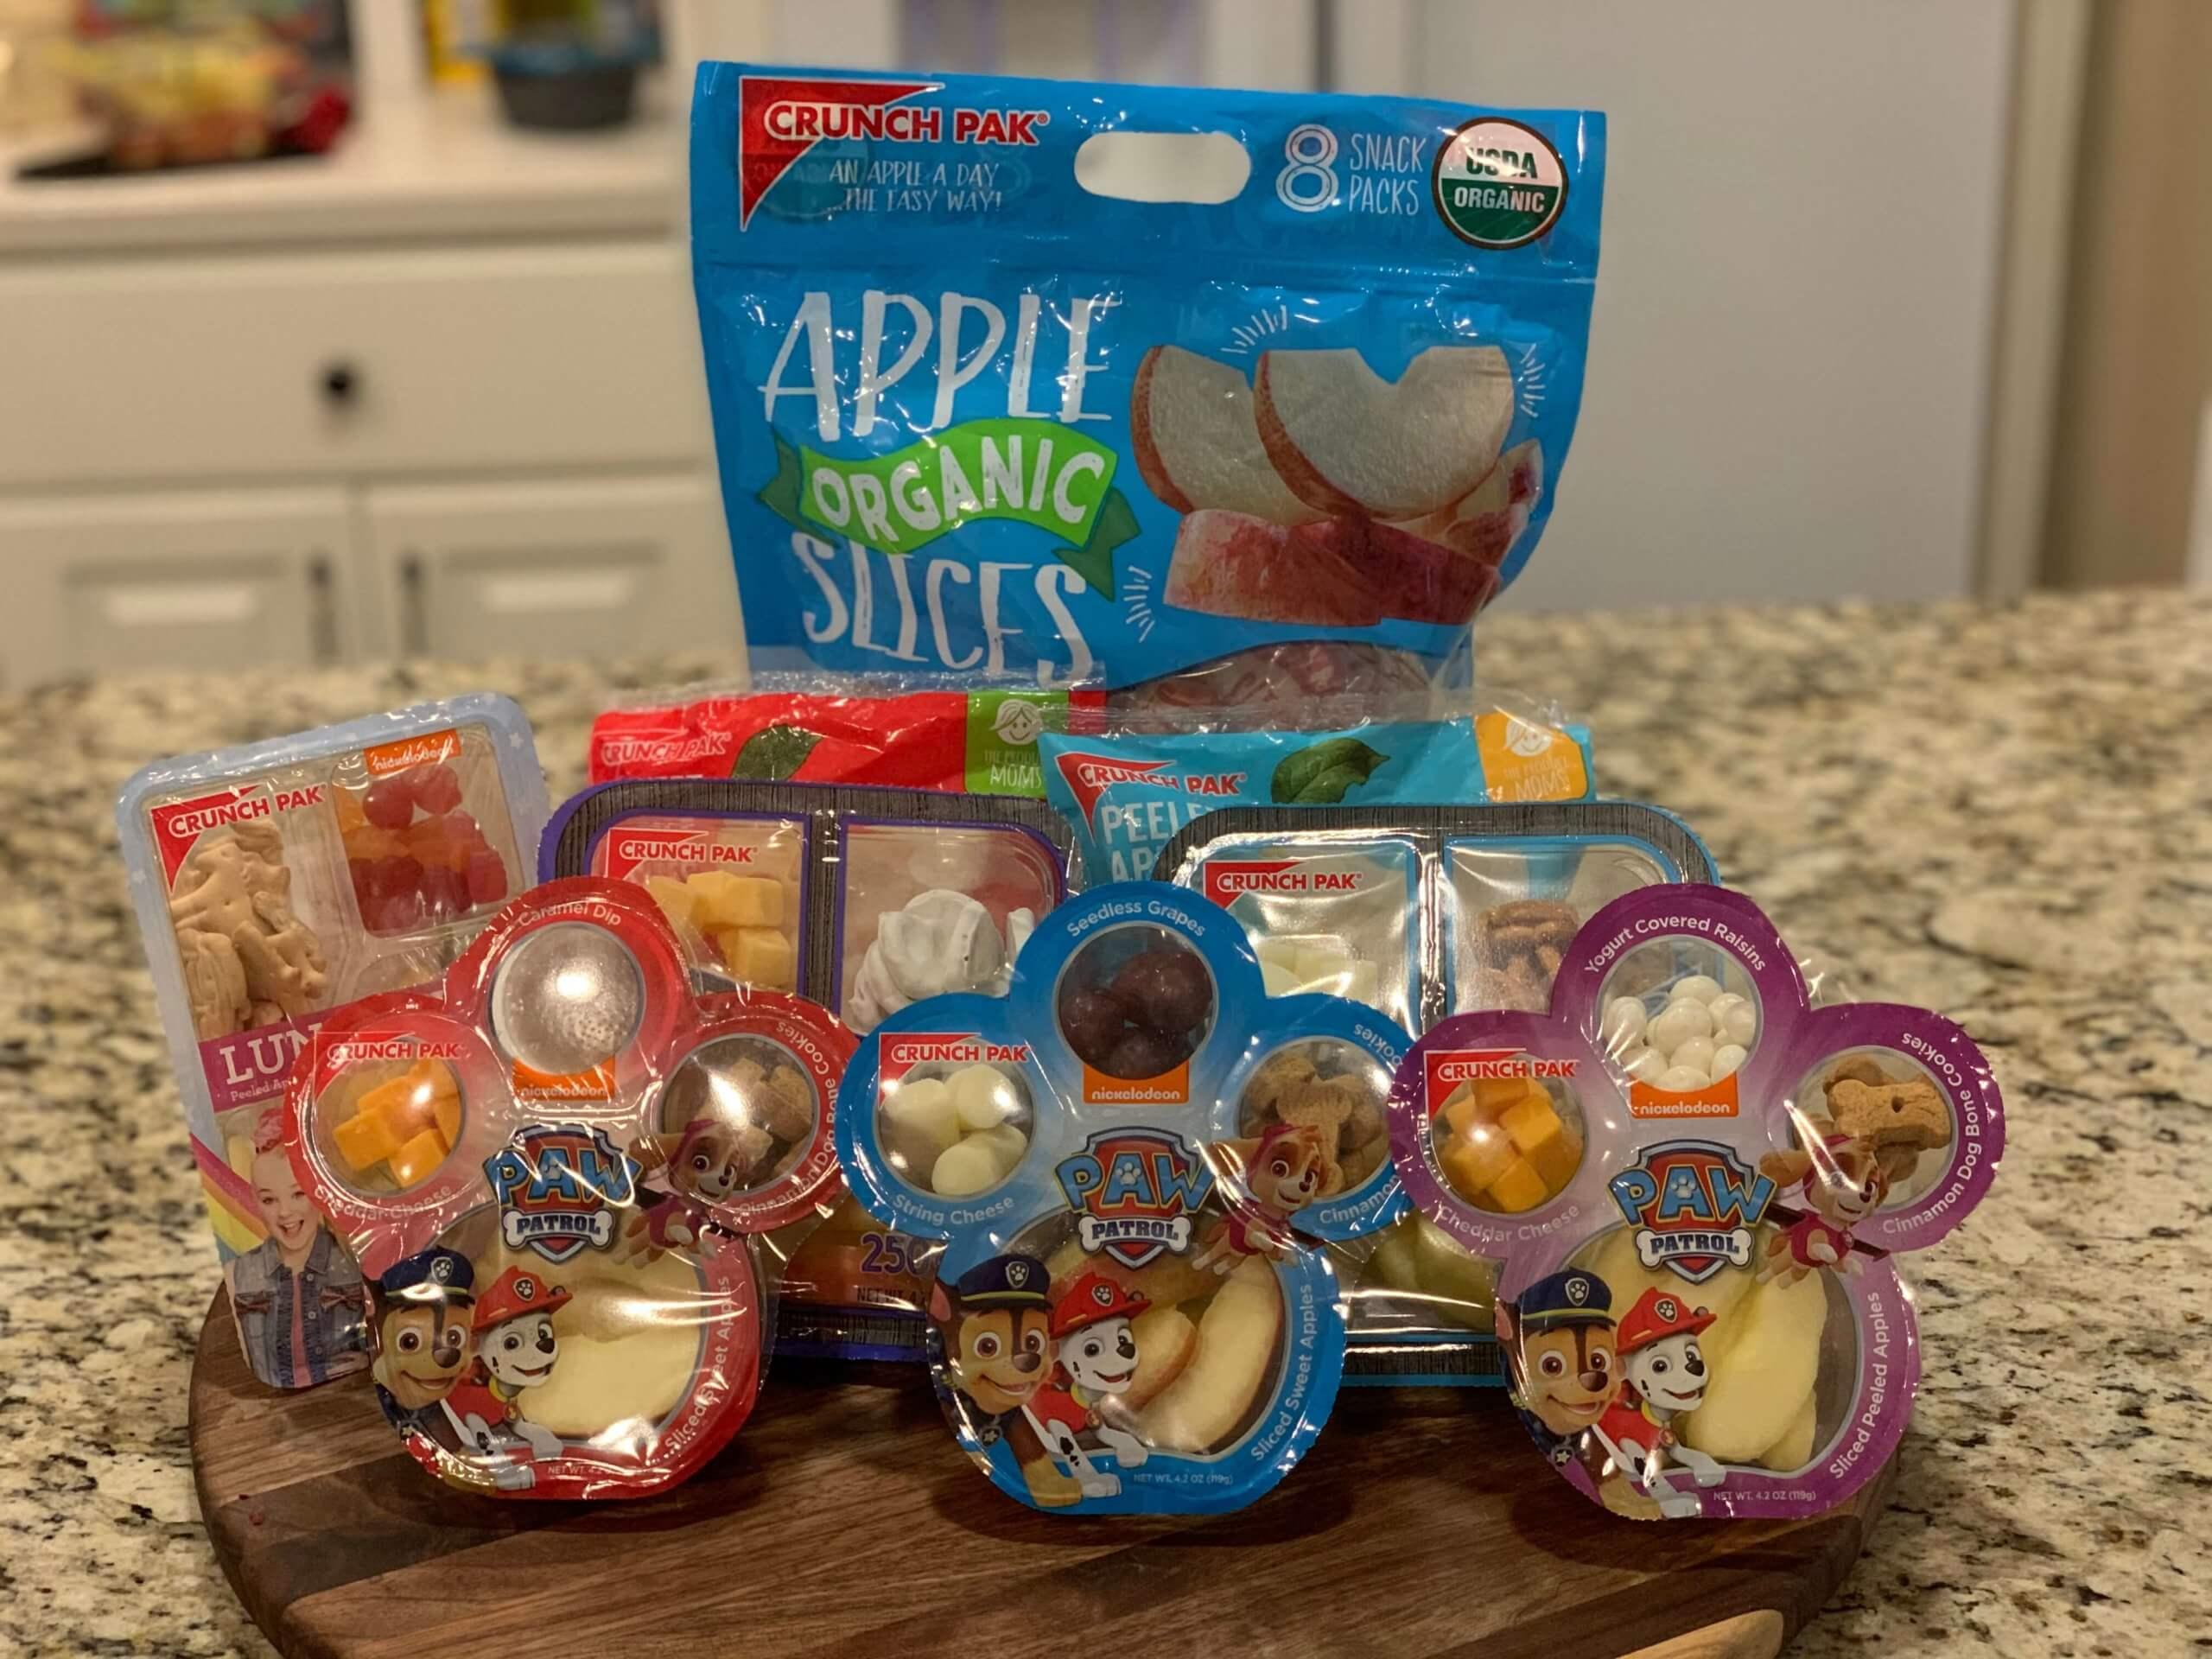 Crunch Pak back-to-school favorites